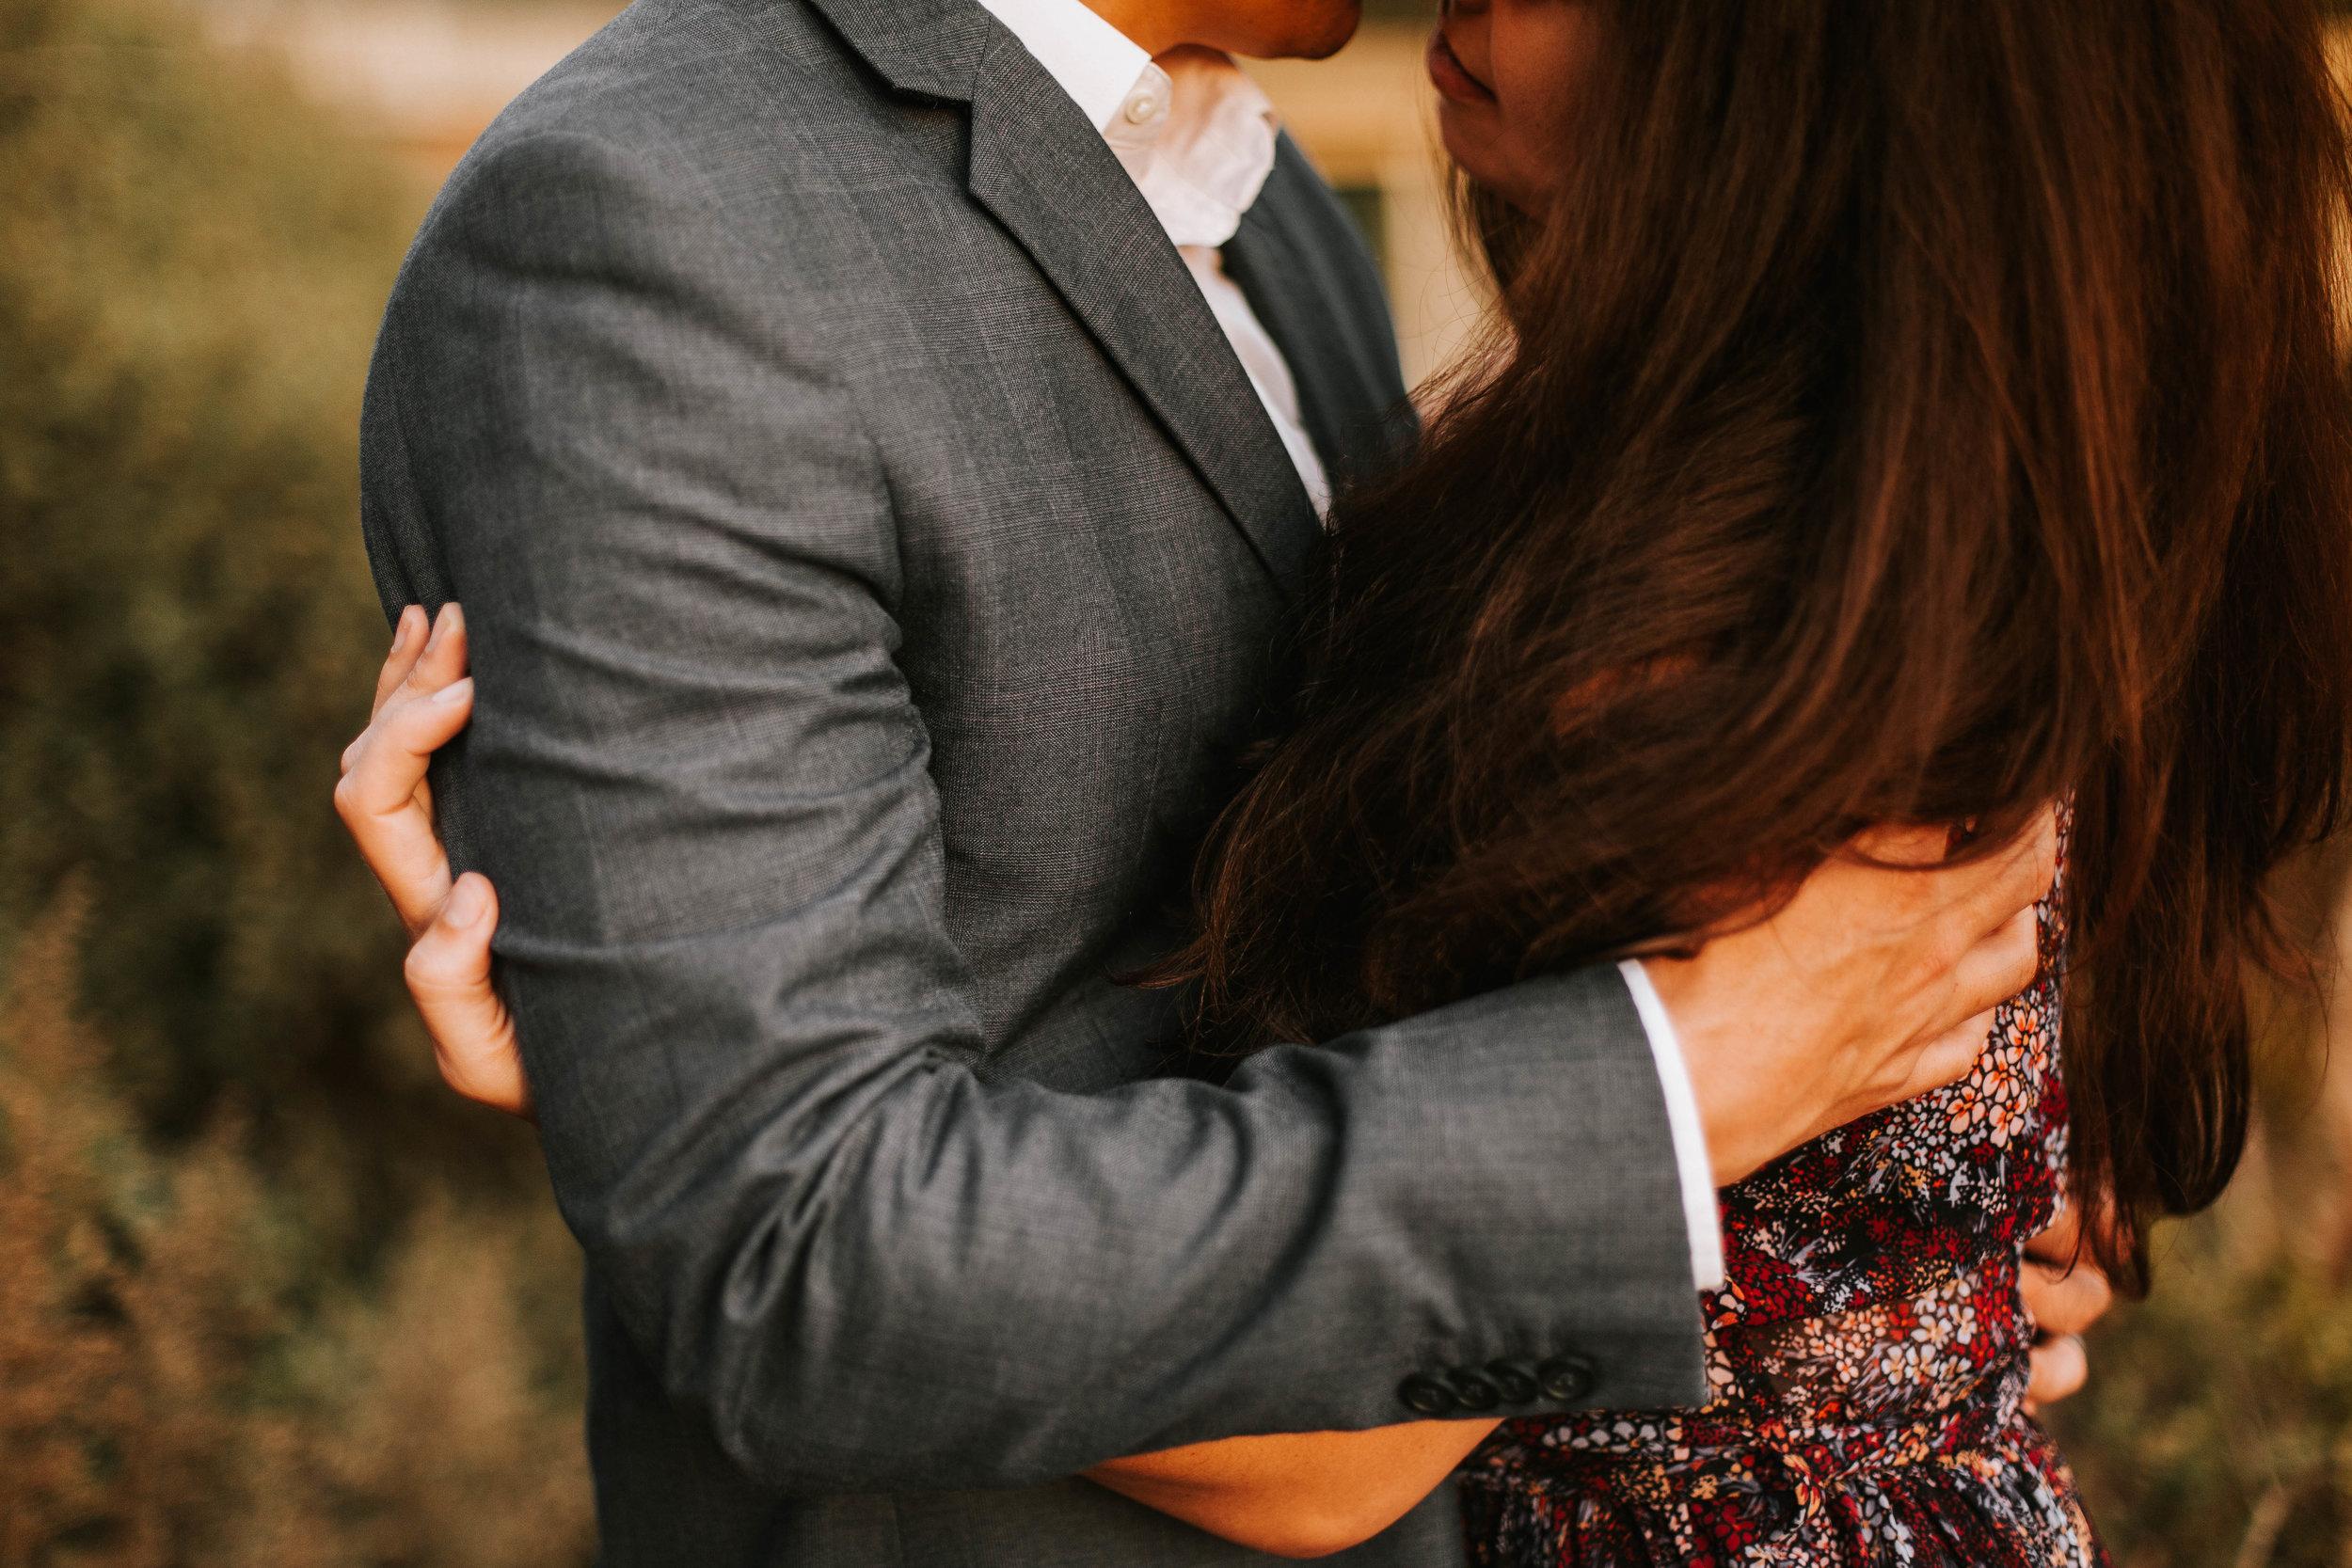 nicole-daacke-photography-big-sur-california-coast-adventure-engagement-photos-adventurous-elopement-intimate-wedding-photographer-golden-coastal-cali-engagement-session-22.jpg